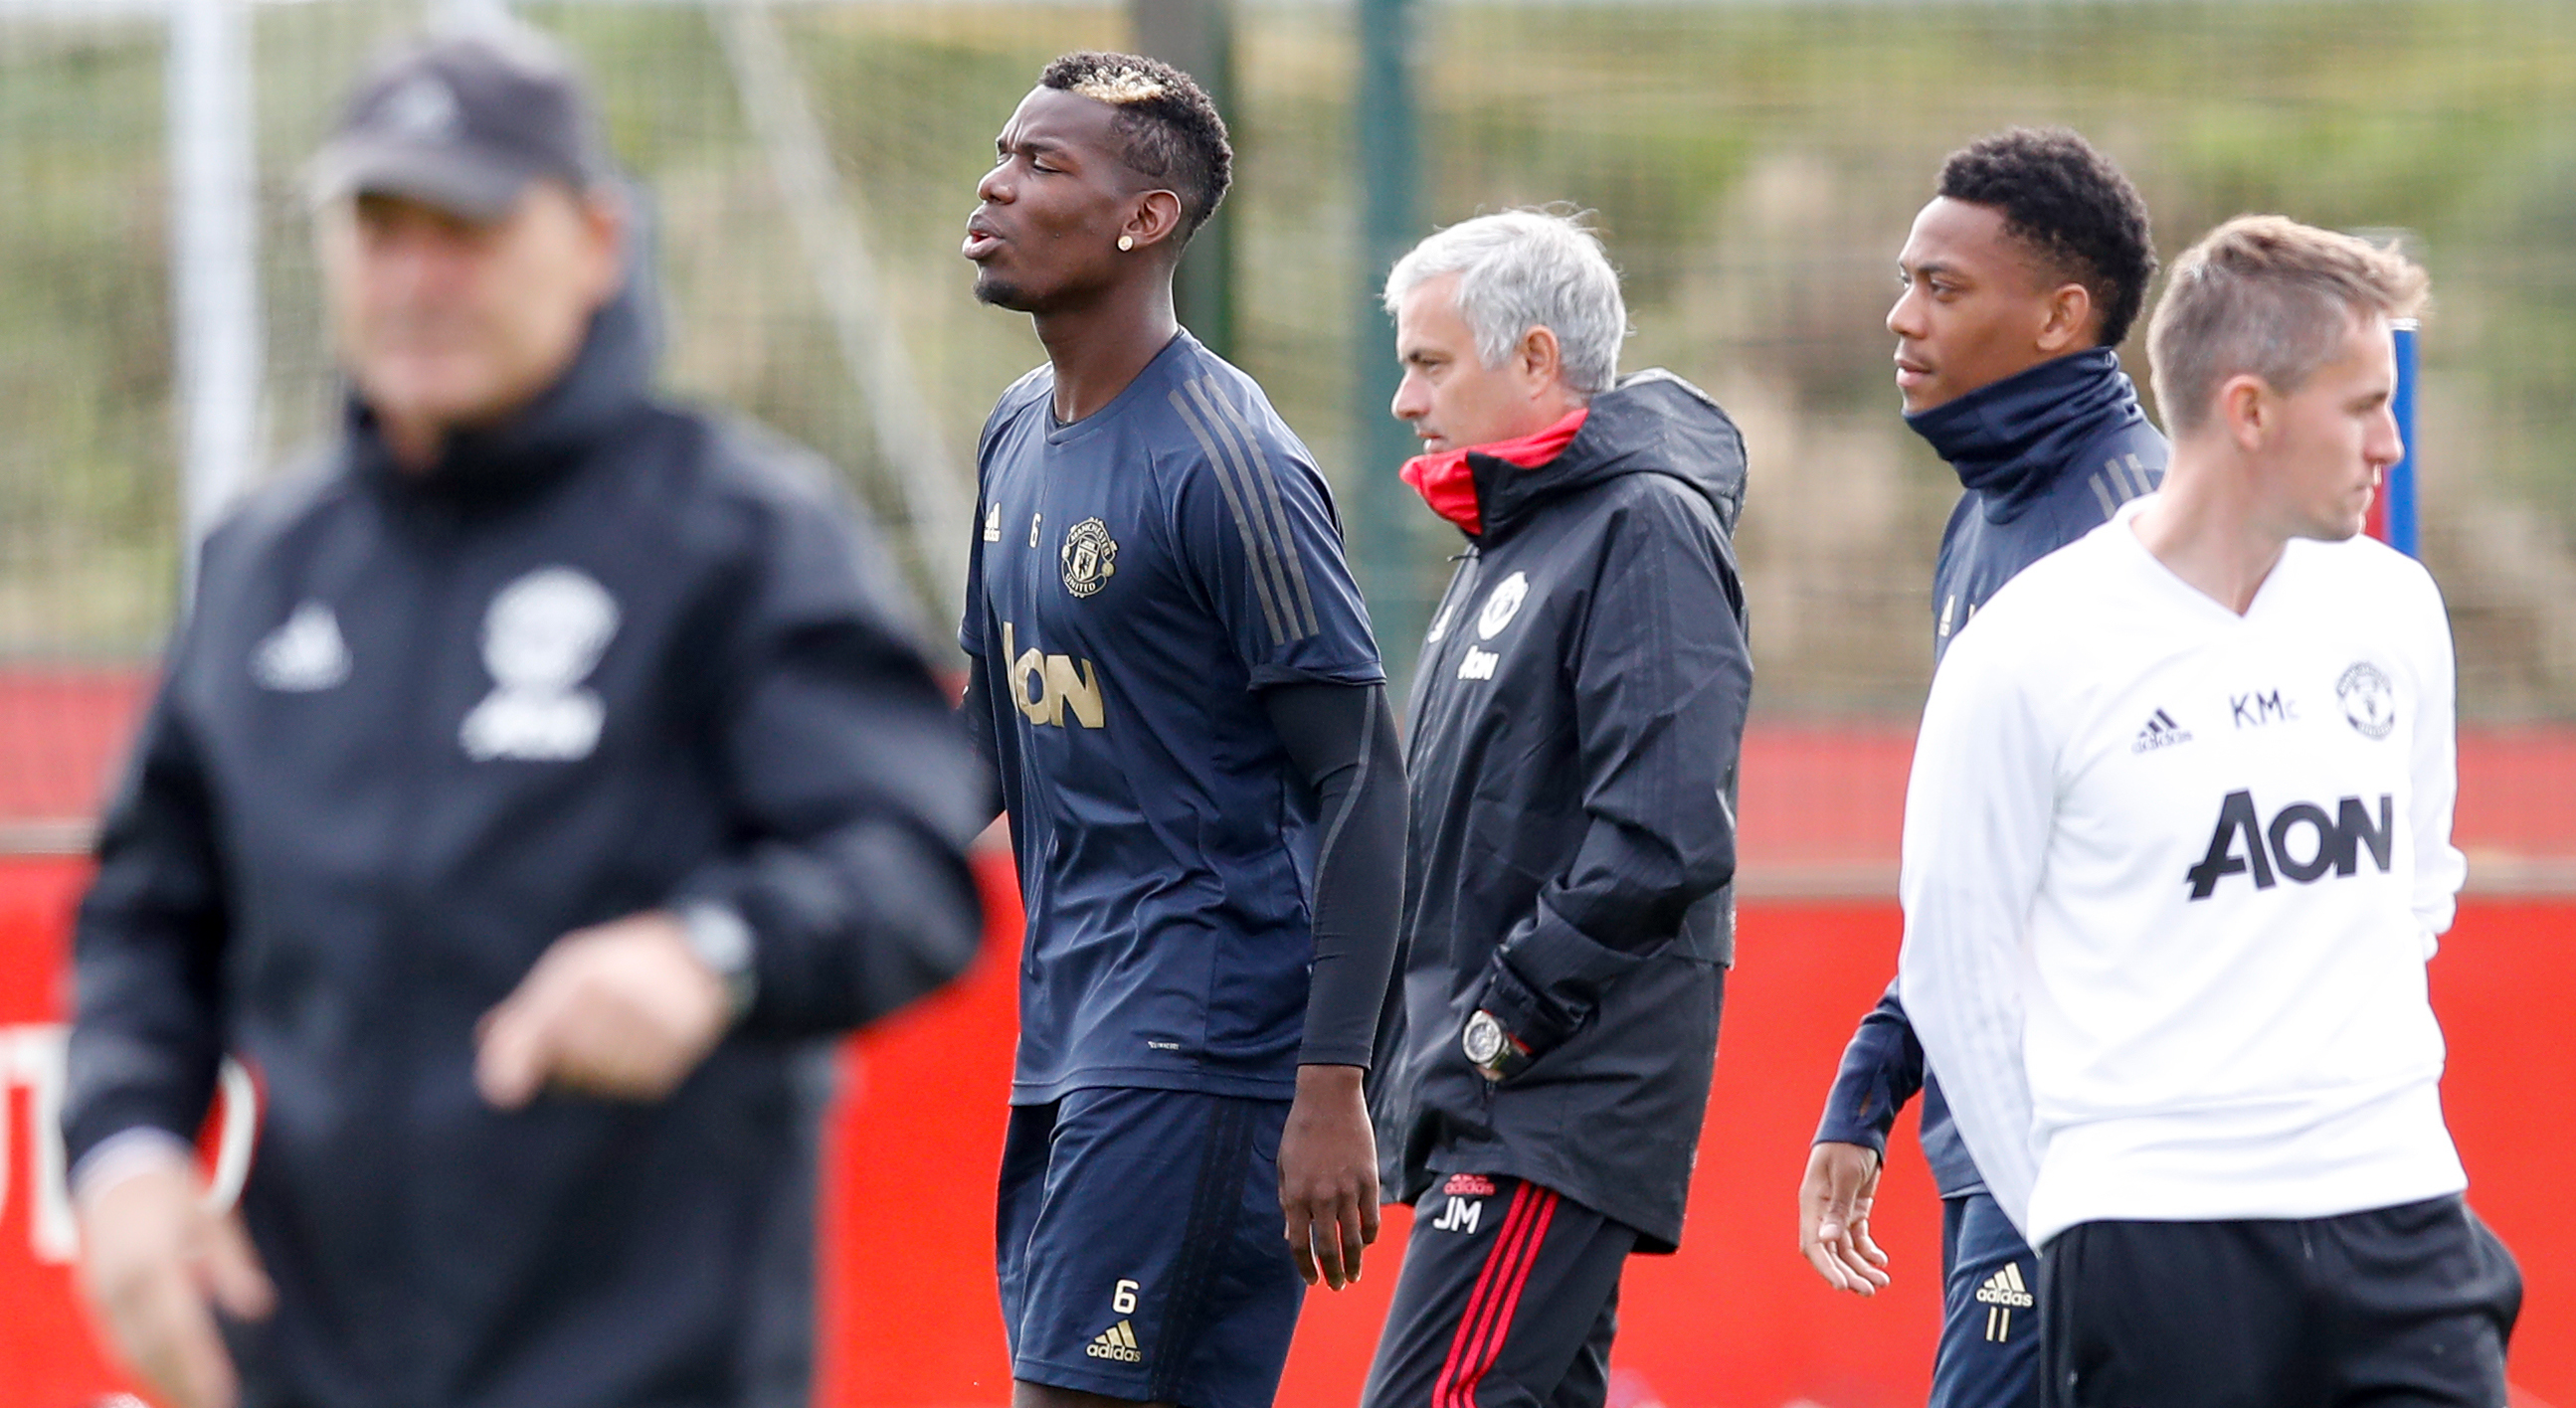 Mino Raiola insists Paul Pogba will remain a Manchester United player